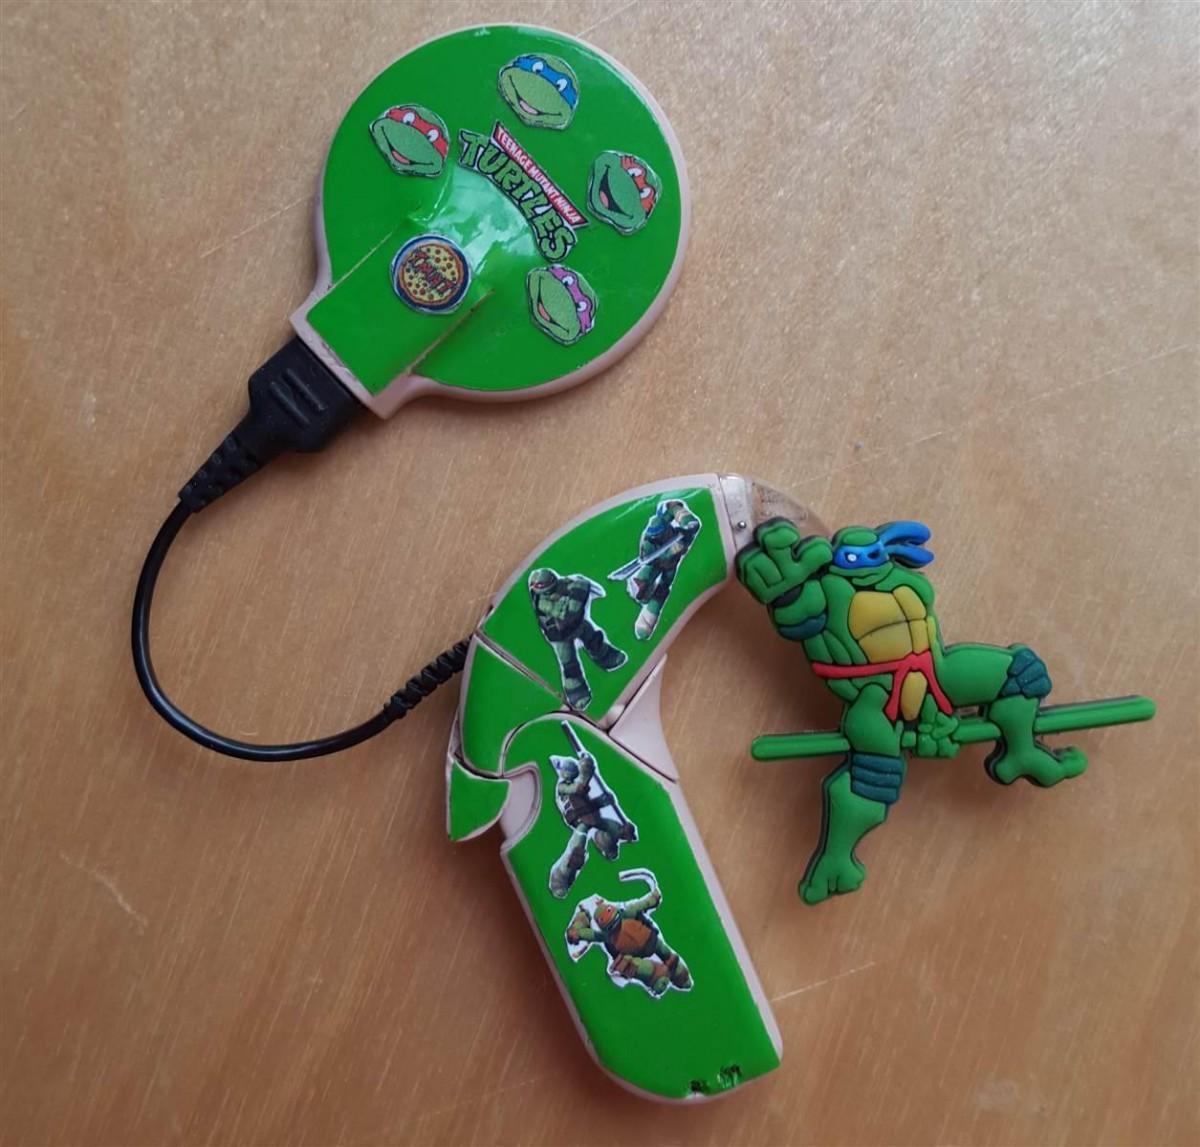 superhero-hearing-aid-kids-today-003-150707_70b03bdac7b5d5dc1733f647f304071e.today-inline-large2x_1255x1200